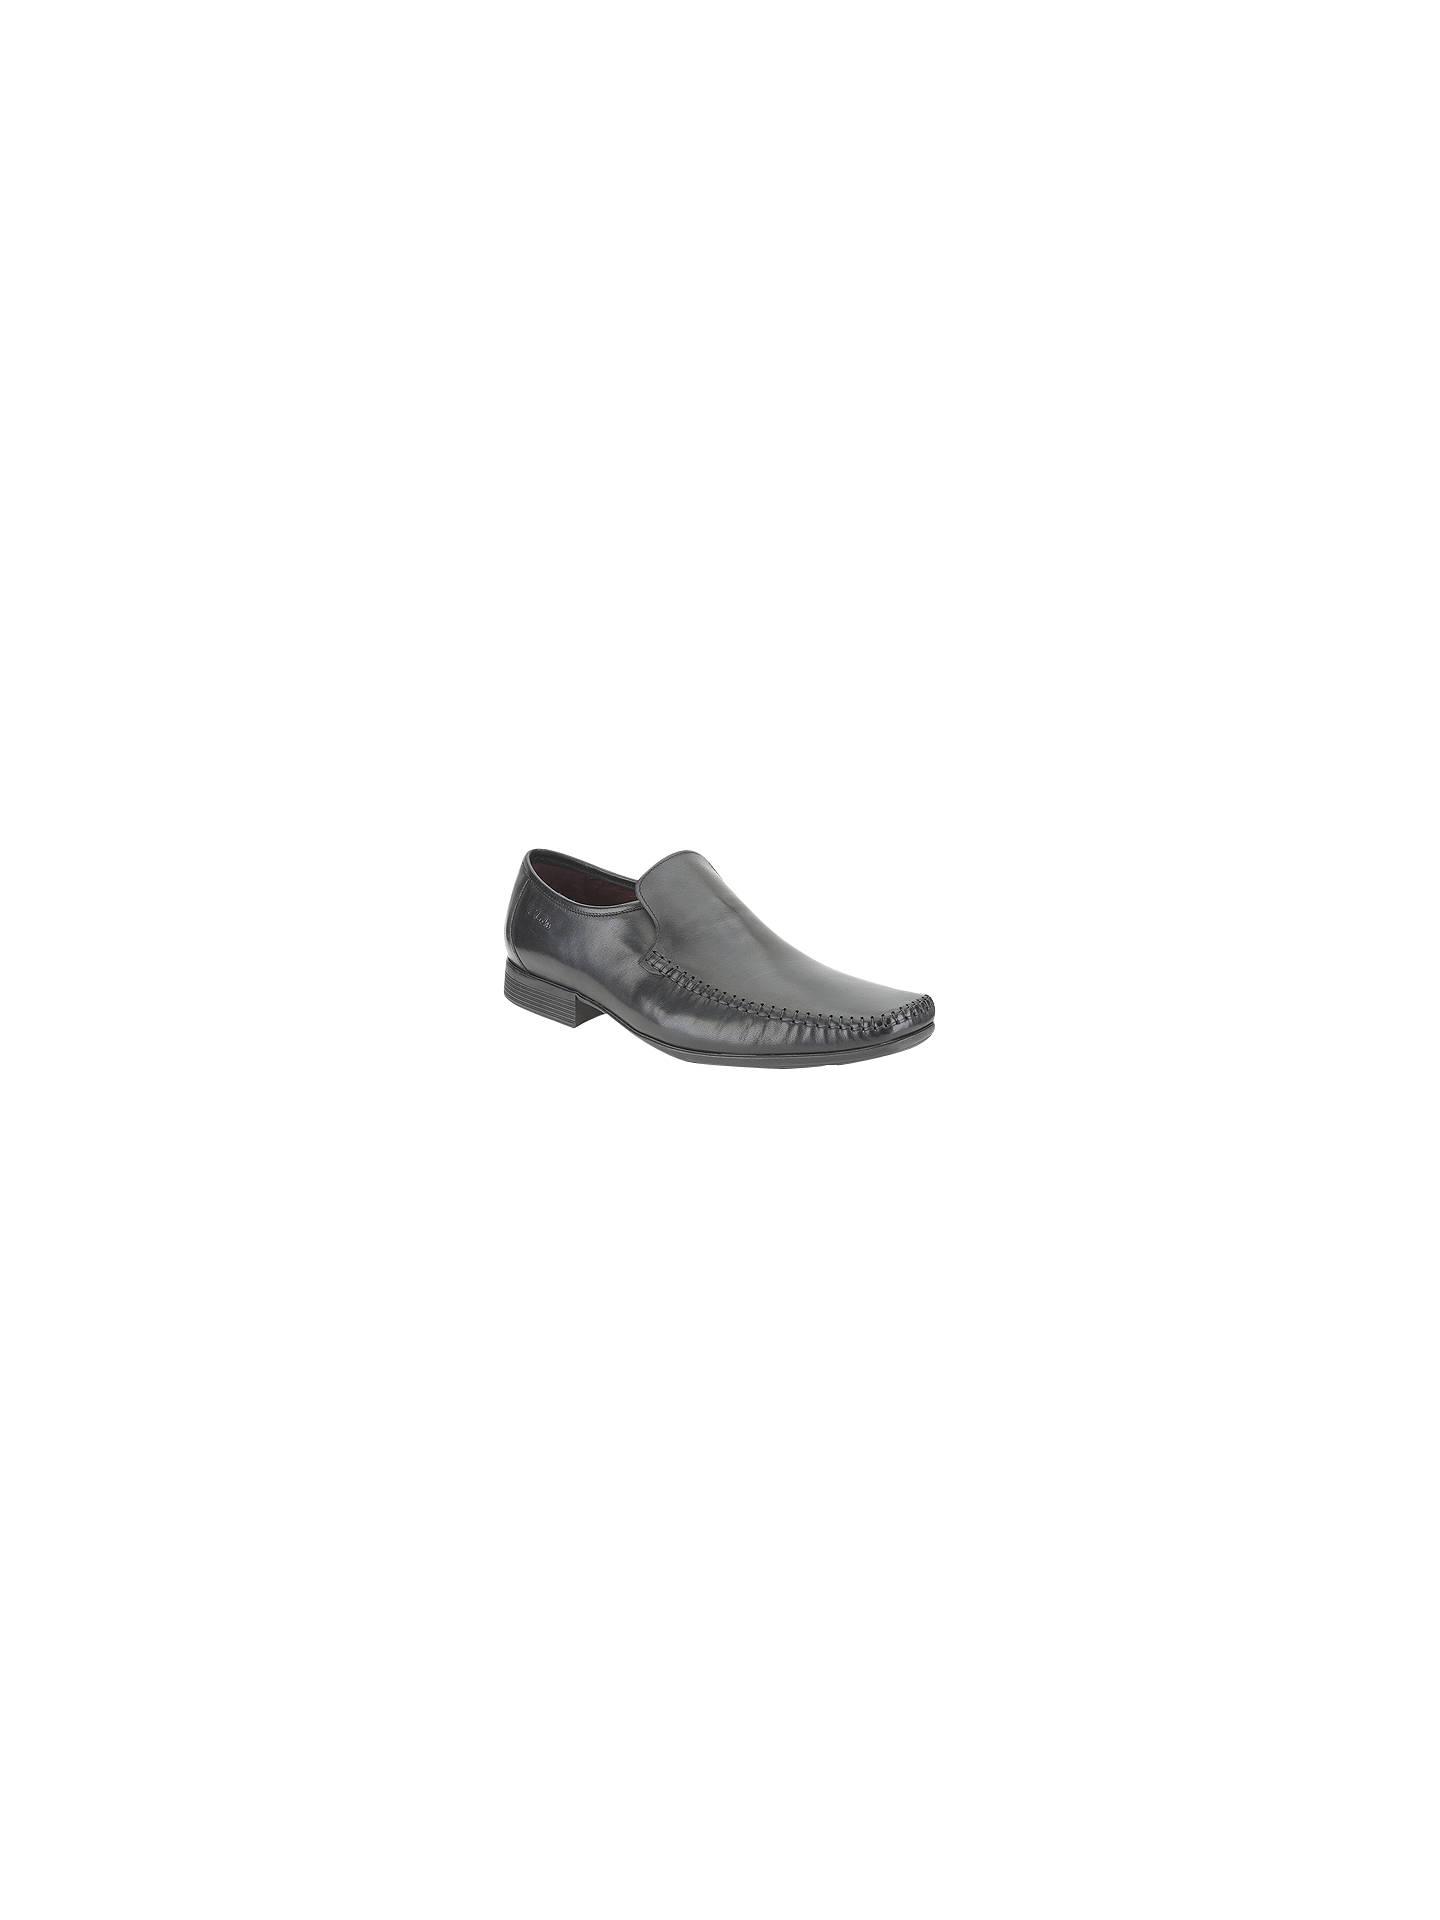 5c3ceb61483 Buy Clarks Ferro Step Loafers